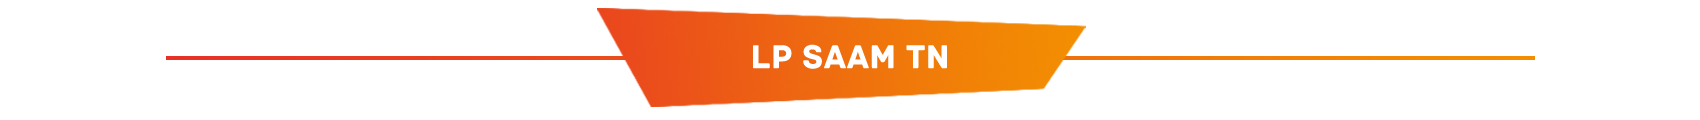 LP SAAM TN